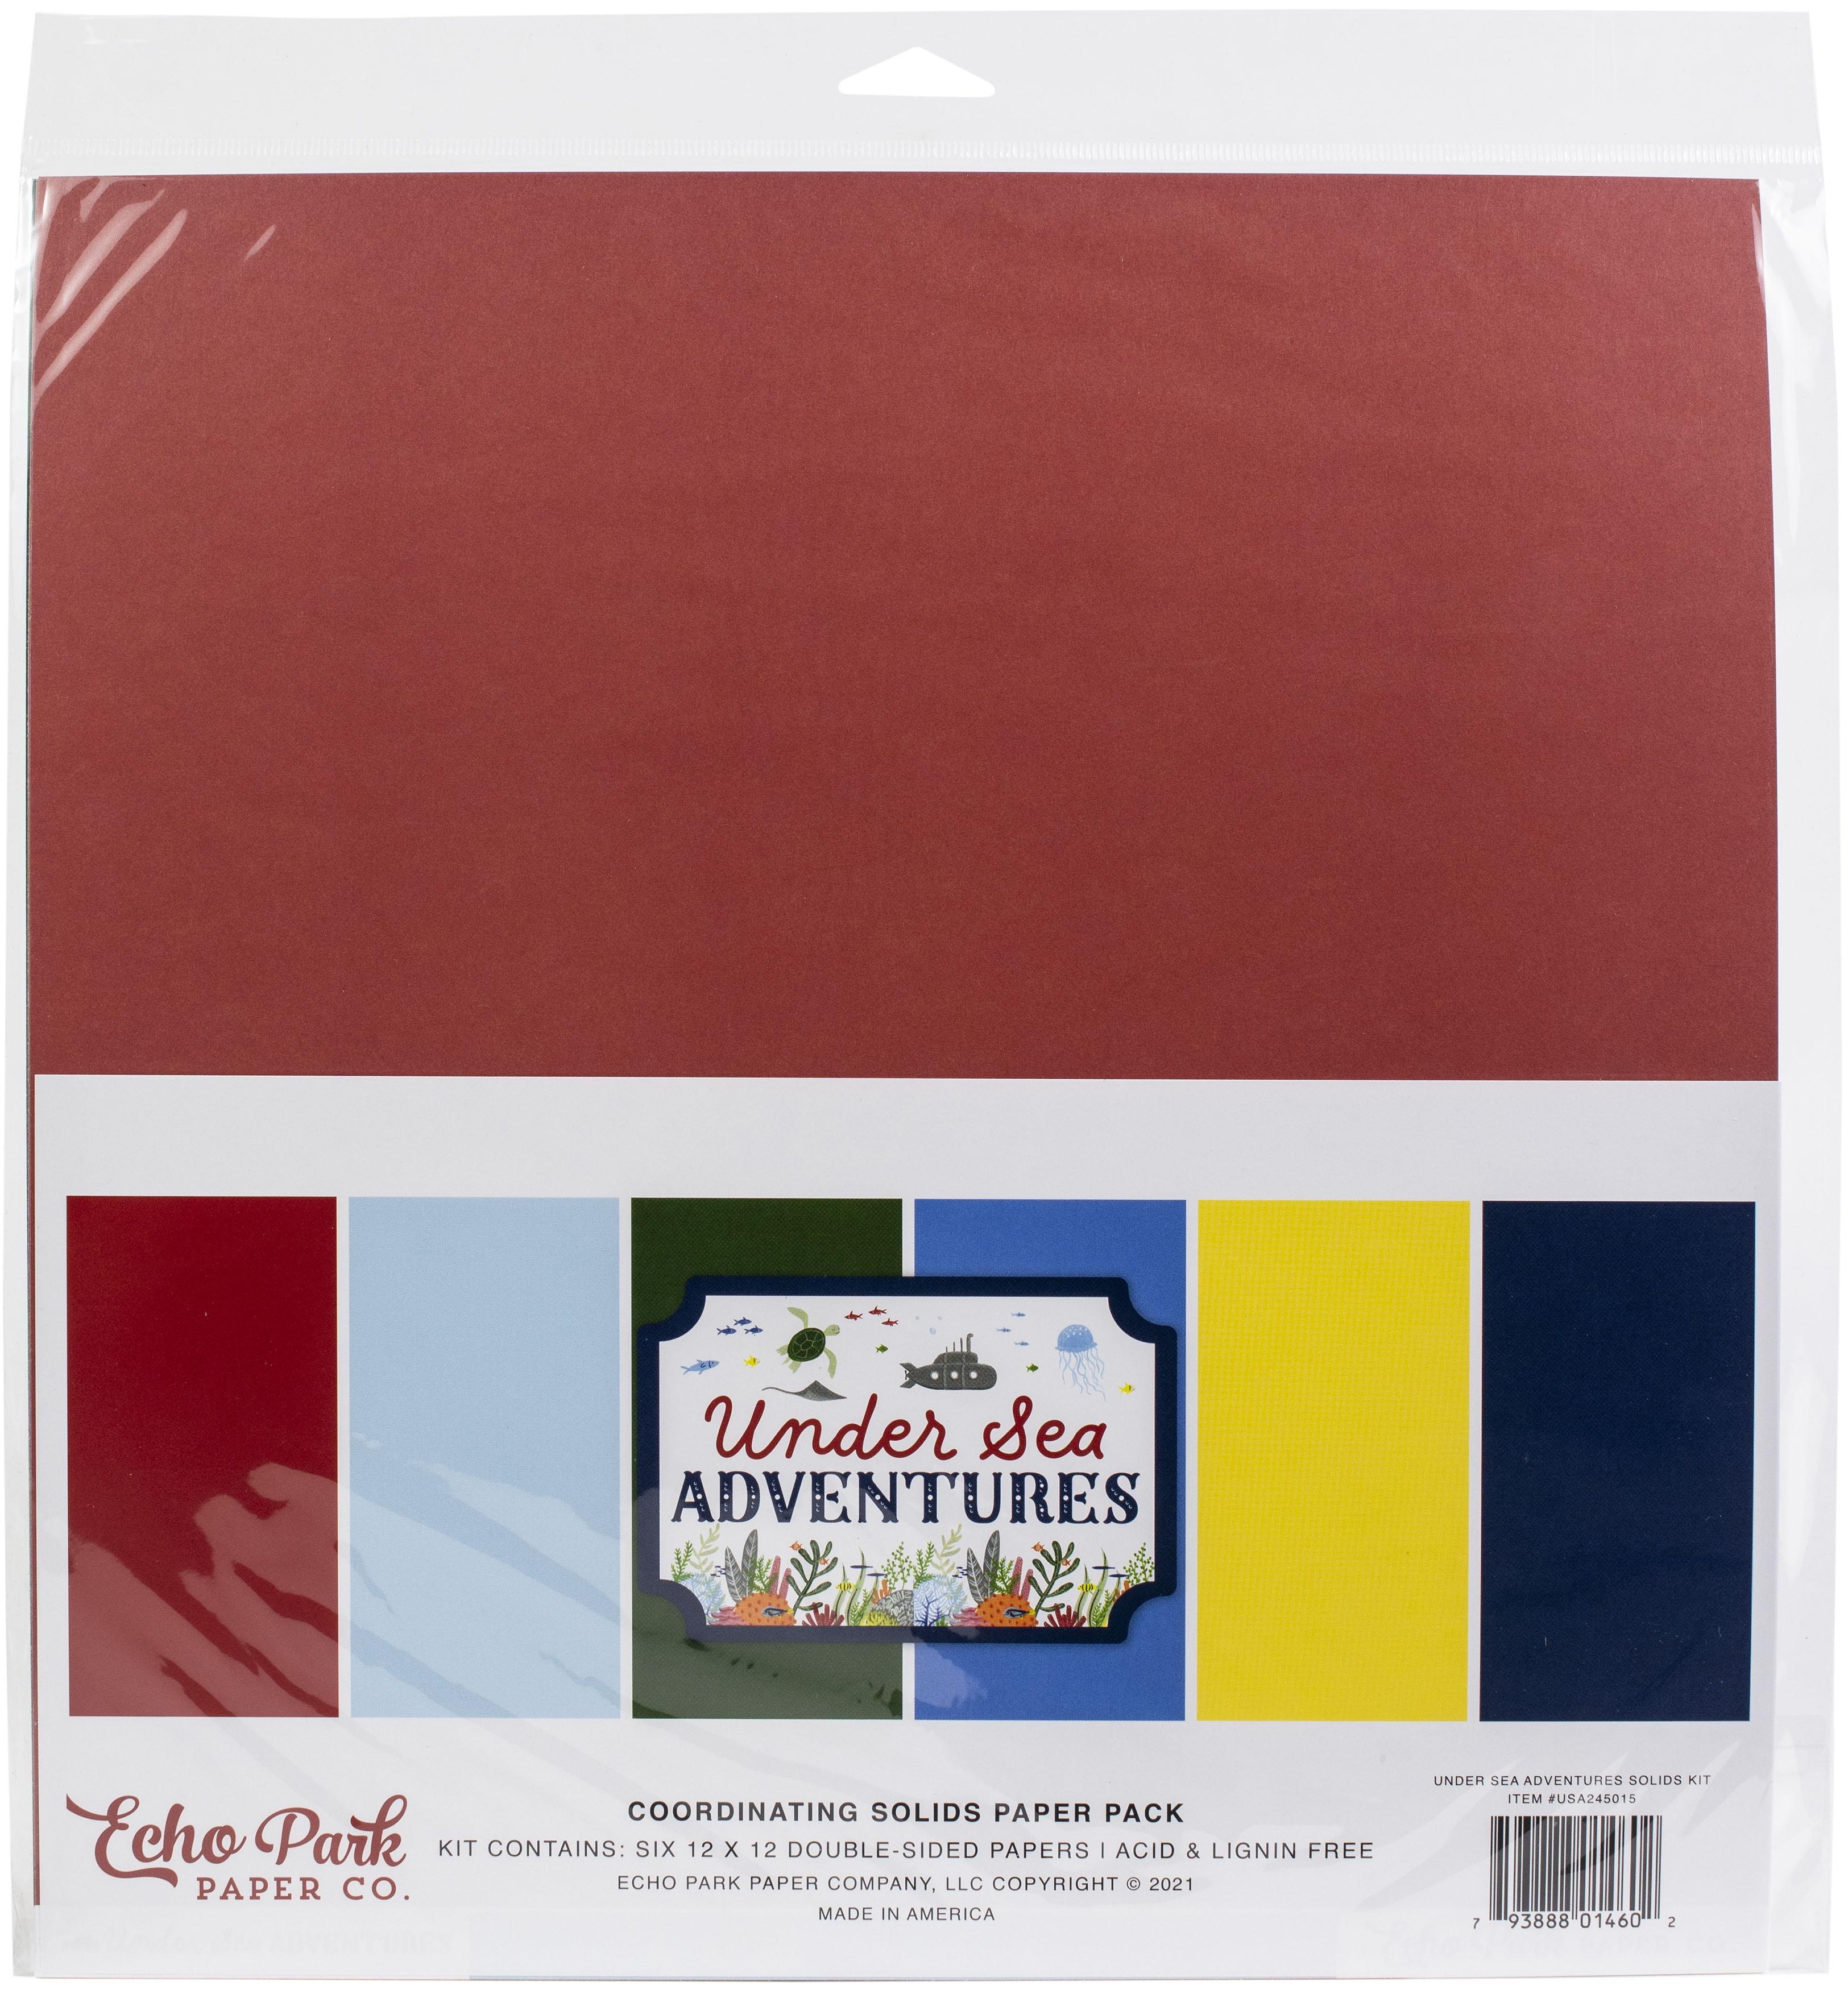 Echo Park - Under Sea Adventures - 12x12 Coordinating Solids Paper Pack